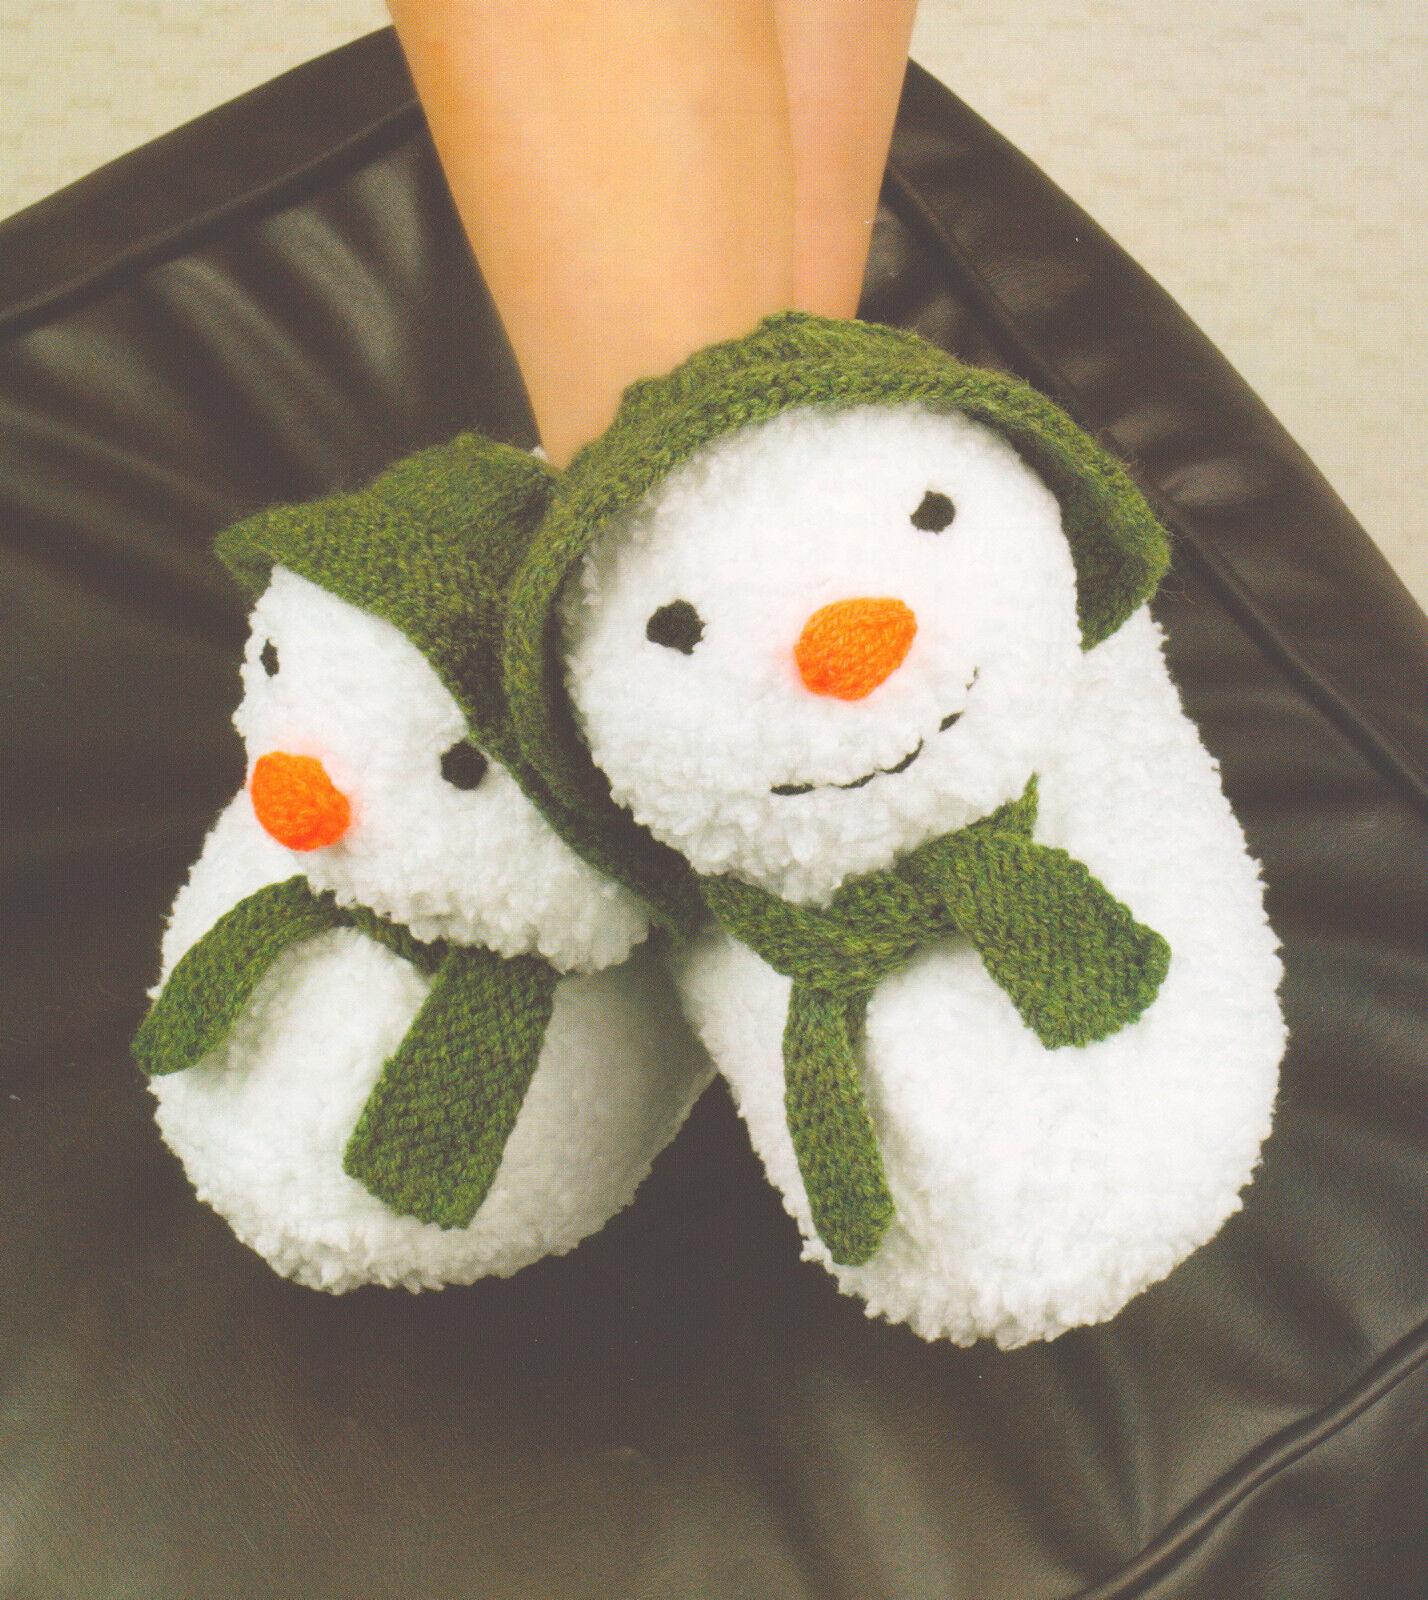 Snowman Cushion Knitting Pattern : Snowman Slippers Children/ Adult DK Knitting Pattern Great Xmas Pressie ! eBay